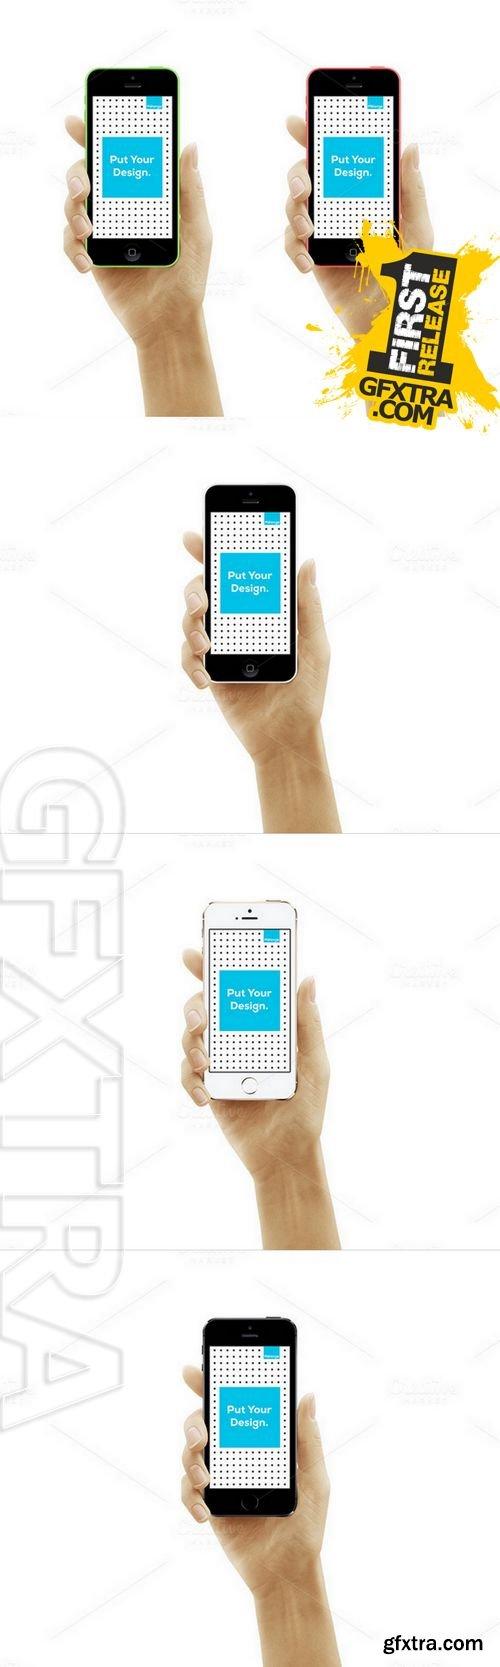 iPhone 5s-5c Mockup - CM 164133